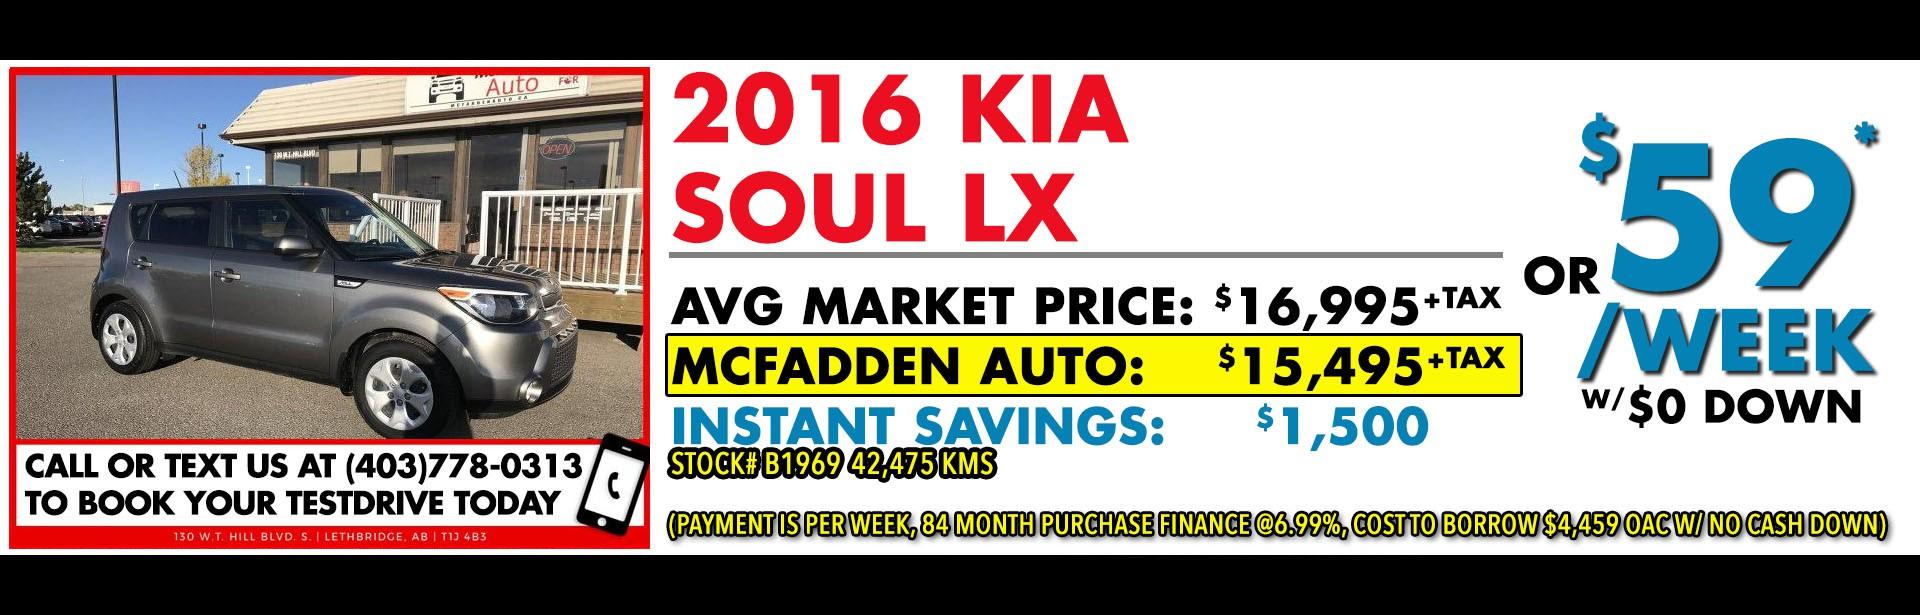 McFadden Auto - B1969 - 2016 Kia Soul LX - Nov 2017 - 1